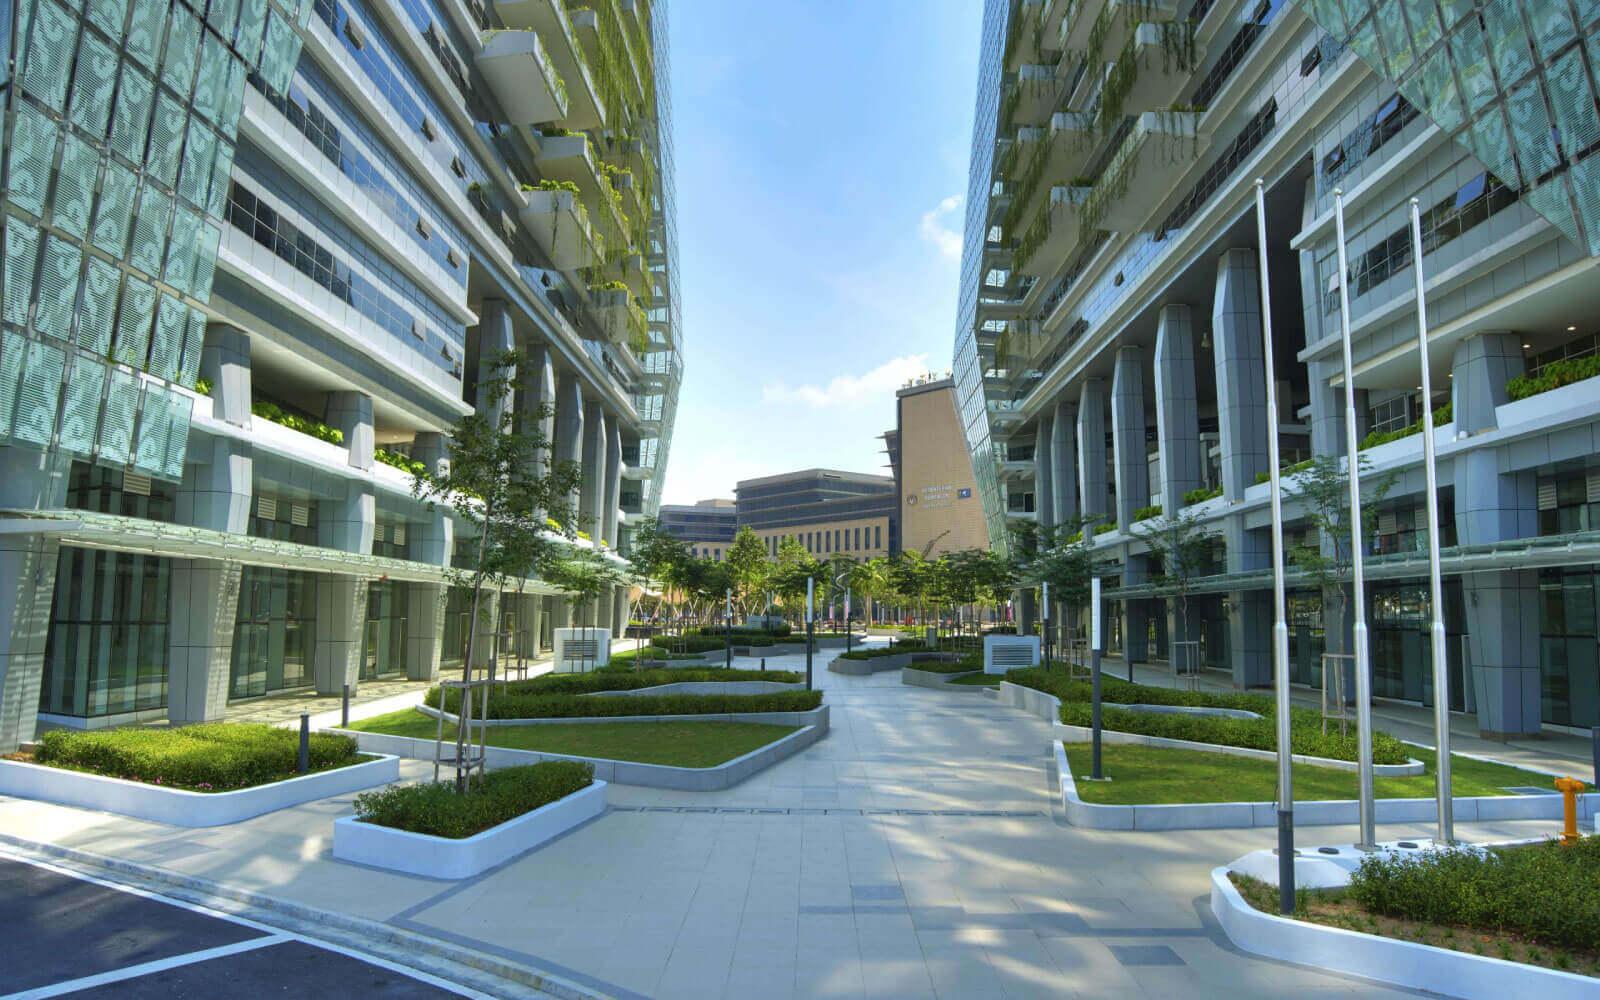 pic 2 of sausana pjh 2c5 ecological architect design